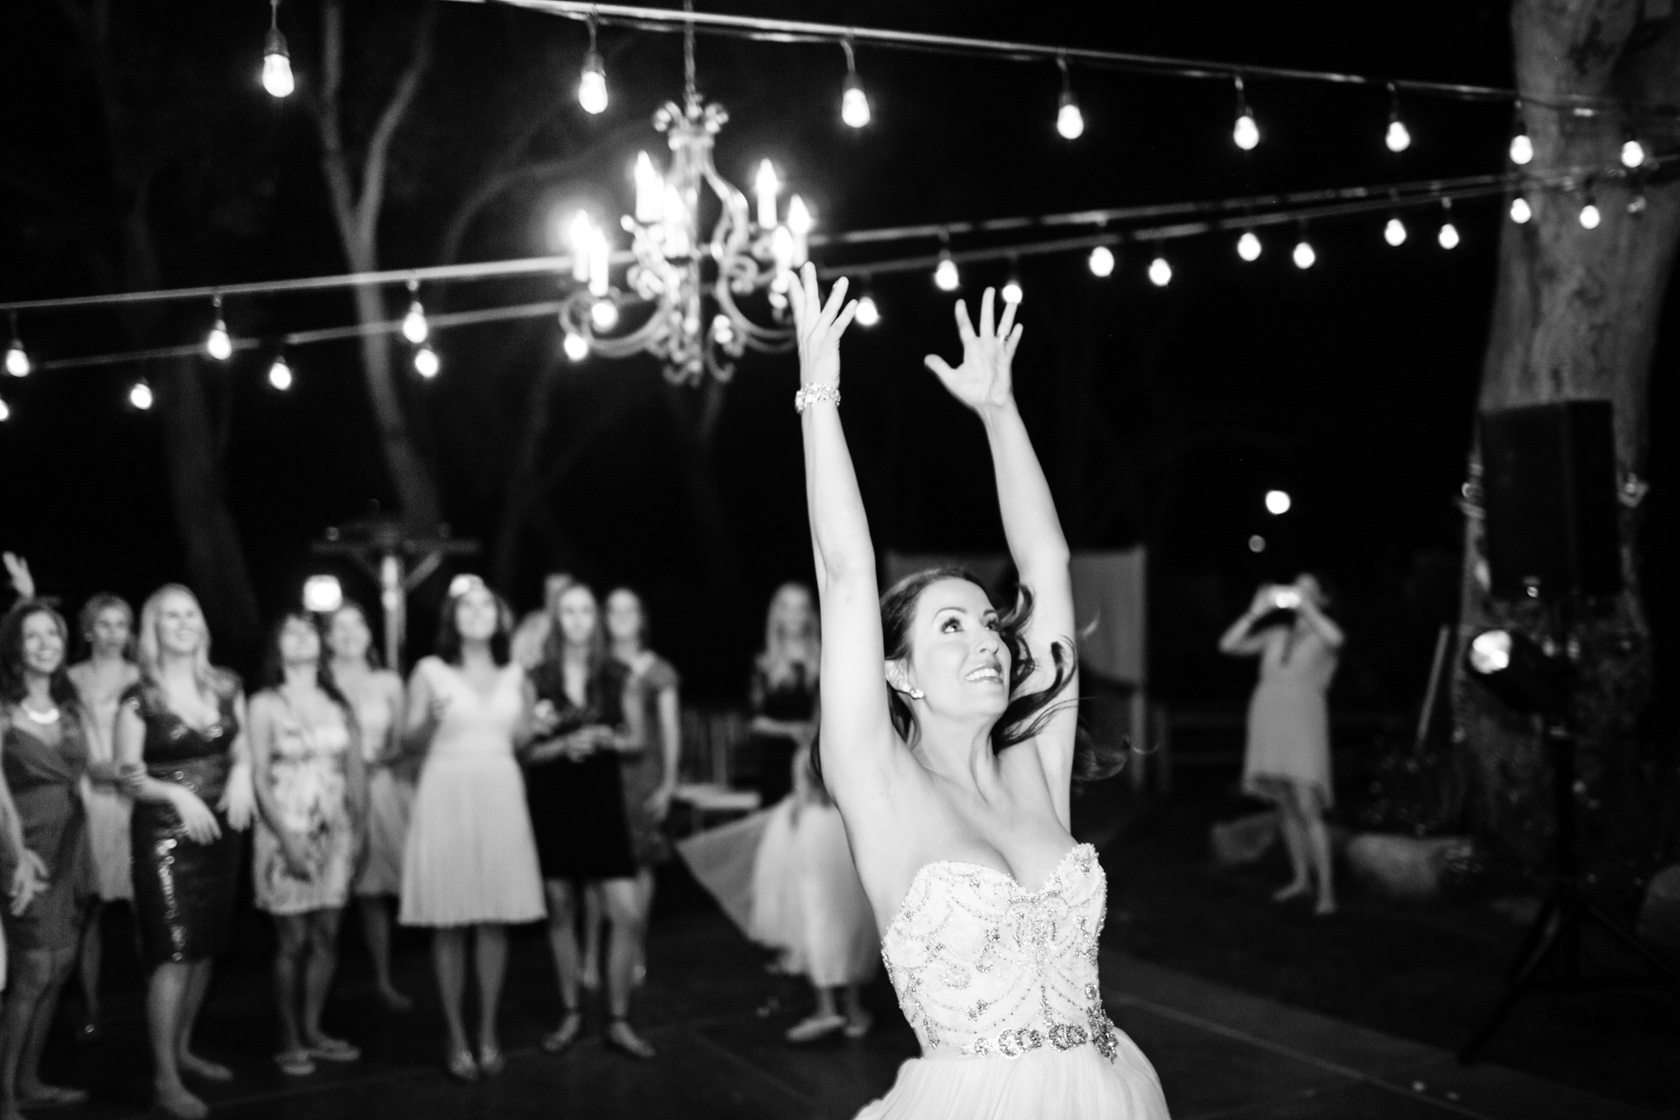 Temecula_Creek_Inn_Wedding_148.jpg